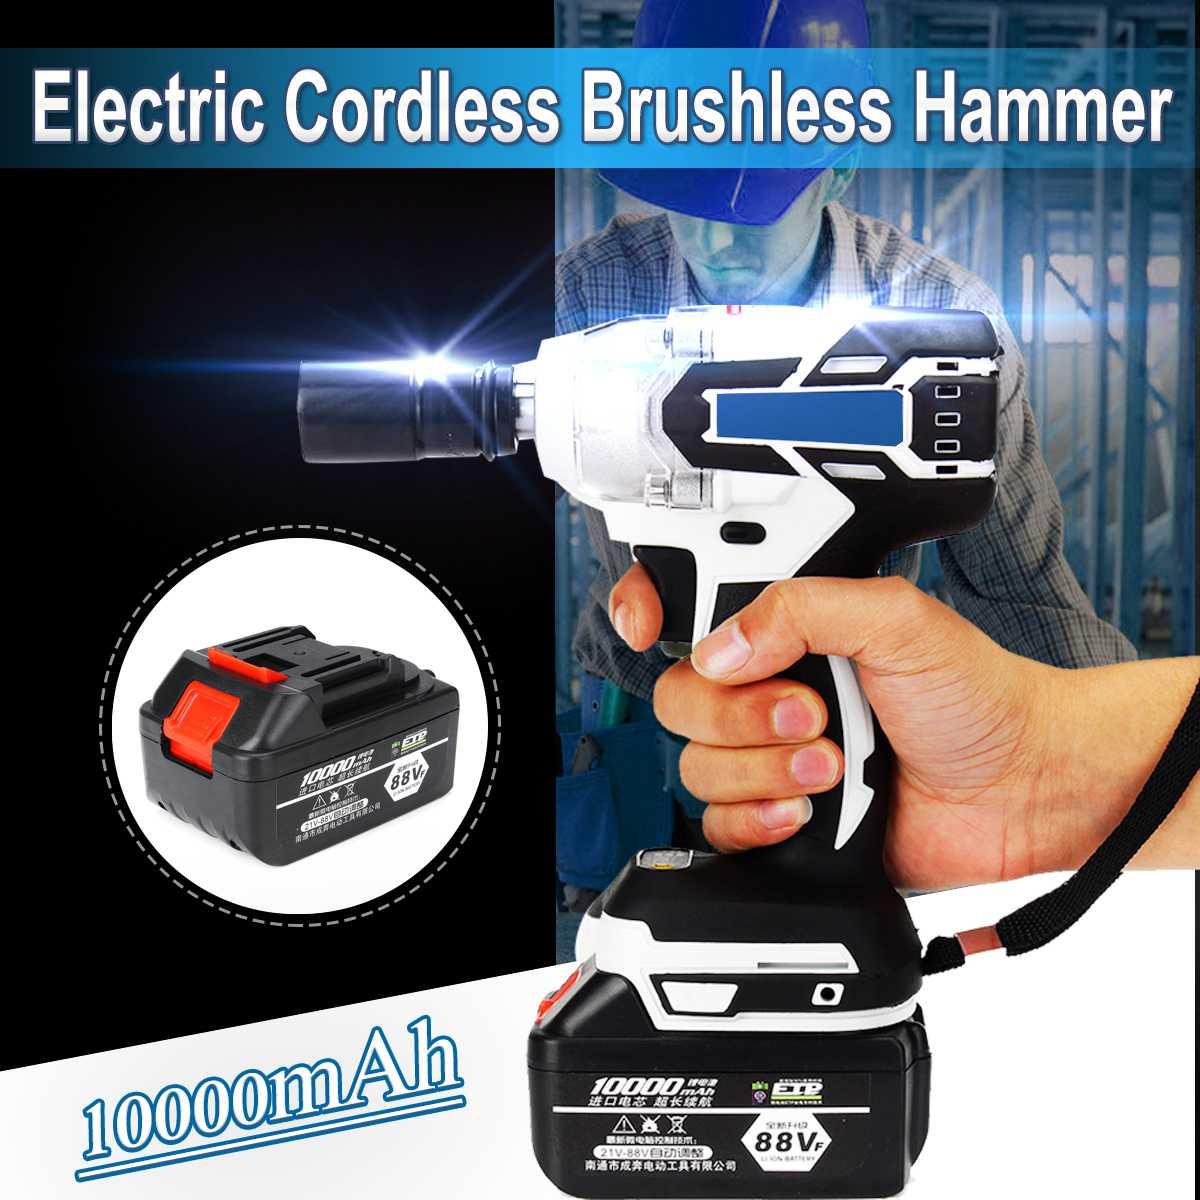 3 IN 1 220V Elektrische Auswirkungen Cordless Bürstenlosen Hammer Bohrer Fahrer Hand Bohrer Hammer Power Tool 240-520NM 10000mAh